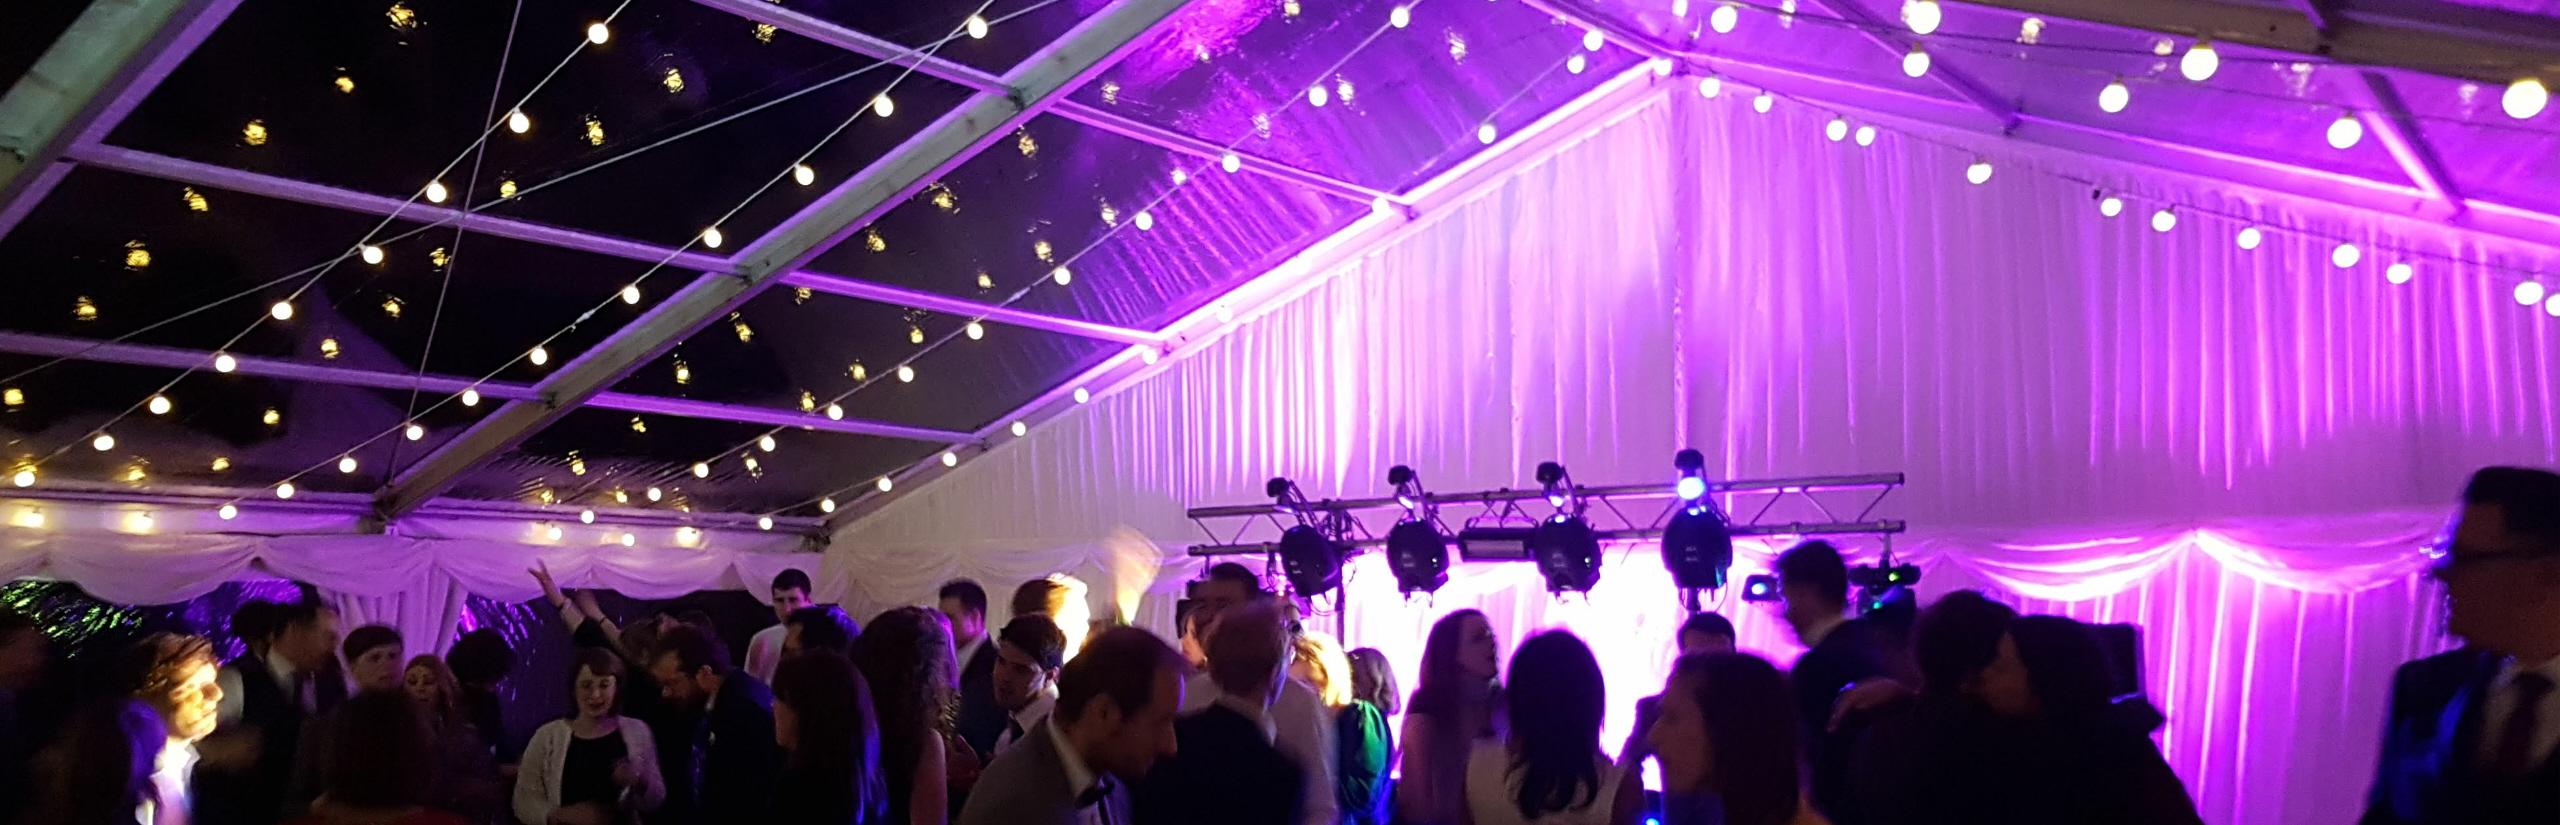 Wedding Lighting Hire Exeter Uplighting Fairy Lights Disco Wedding Exeter Devon